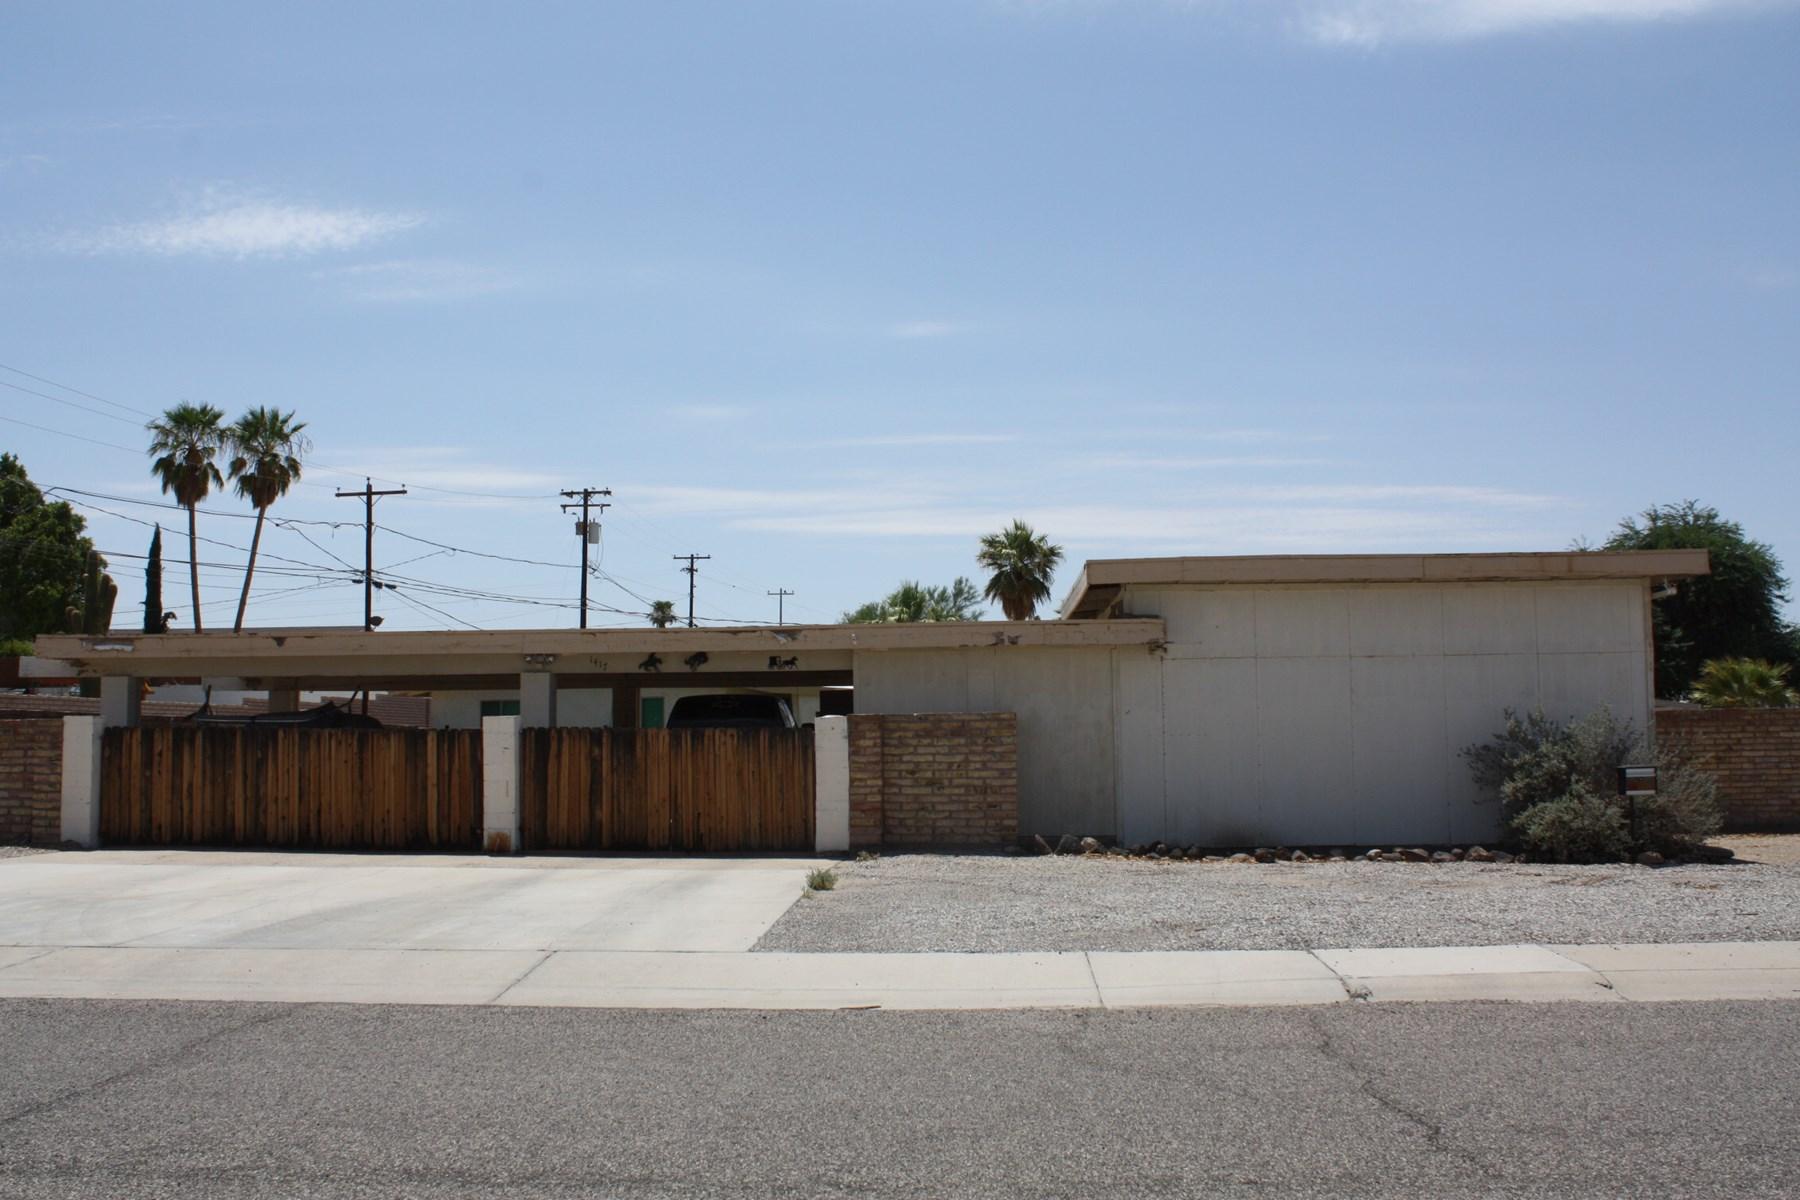 3 Bedroom Home with garage and carport Parker, AZ